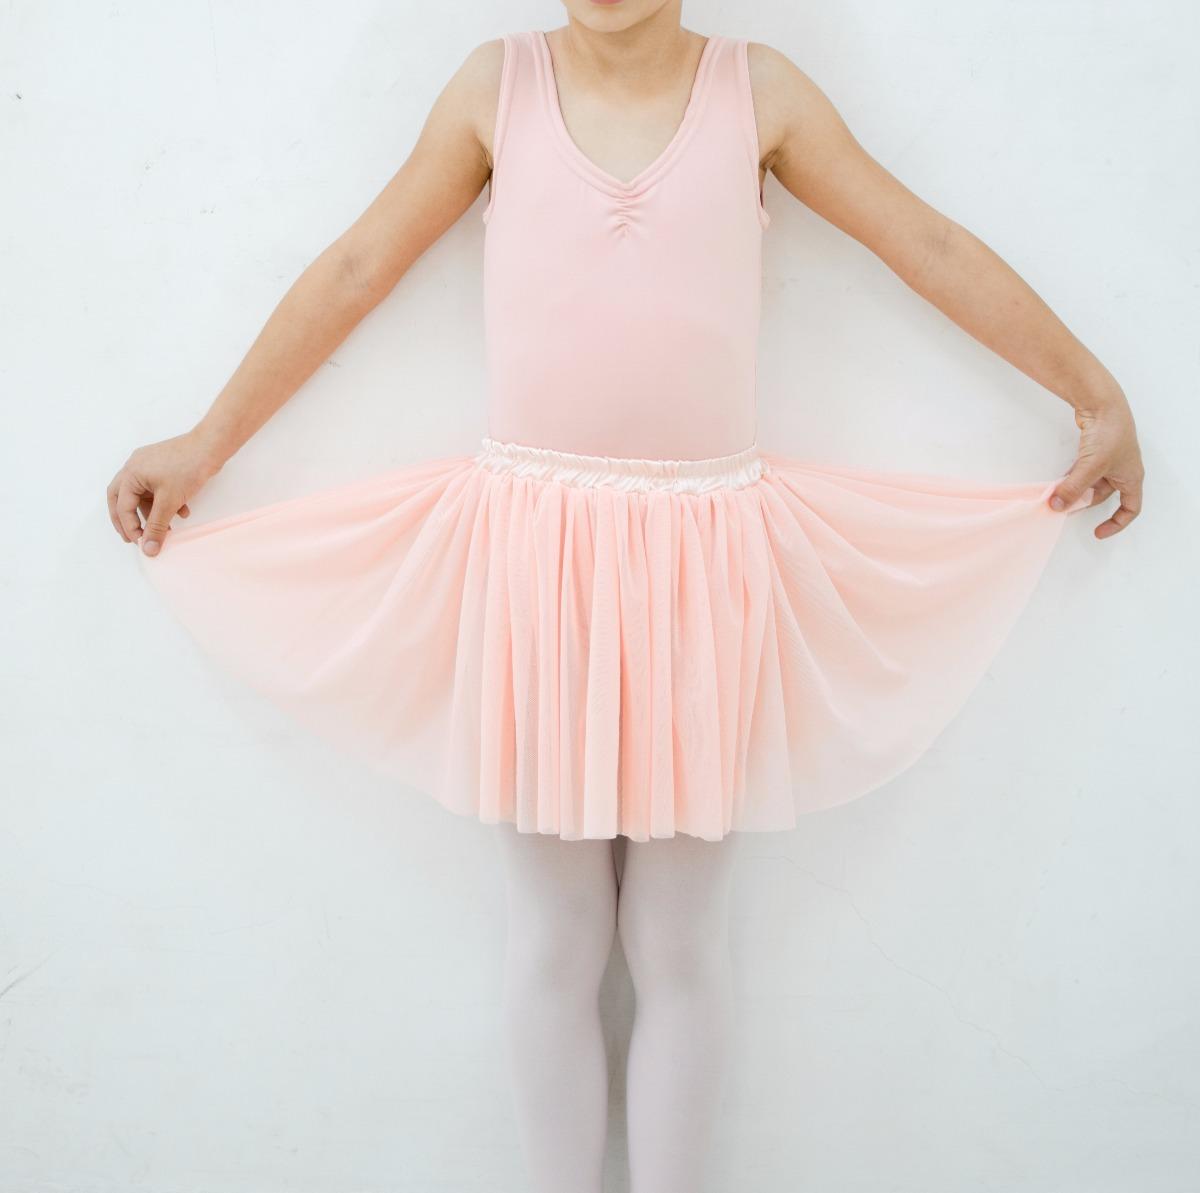 165229c73a kit ballet balé roupa olga georgia 2 collant 2 sapatilhas. Carregando zoom.